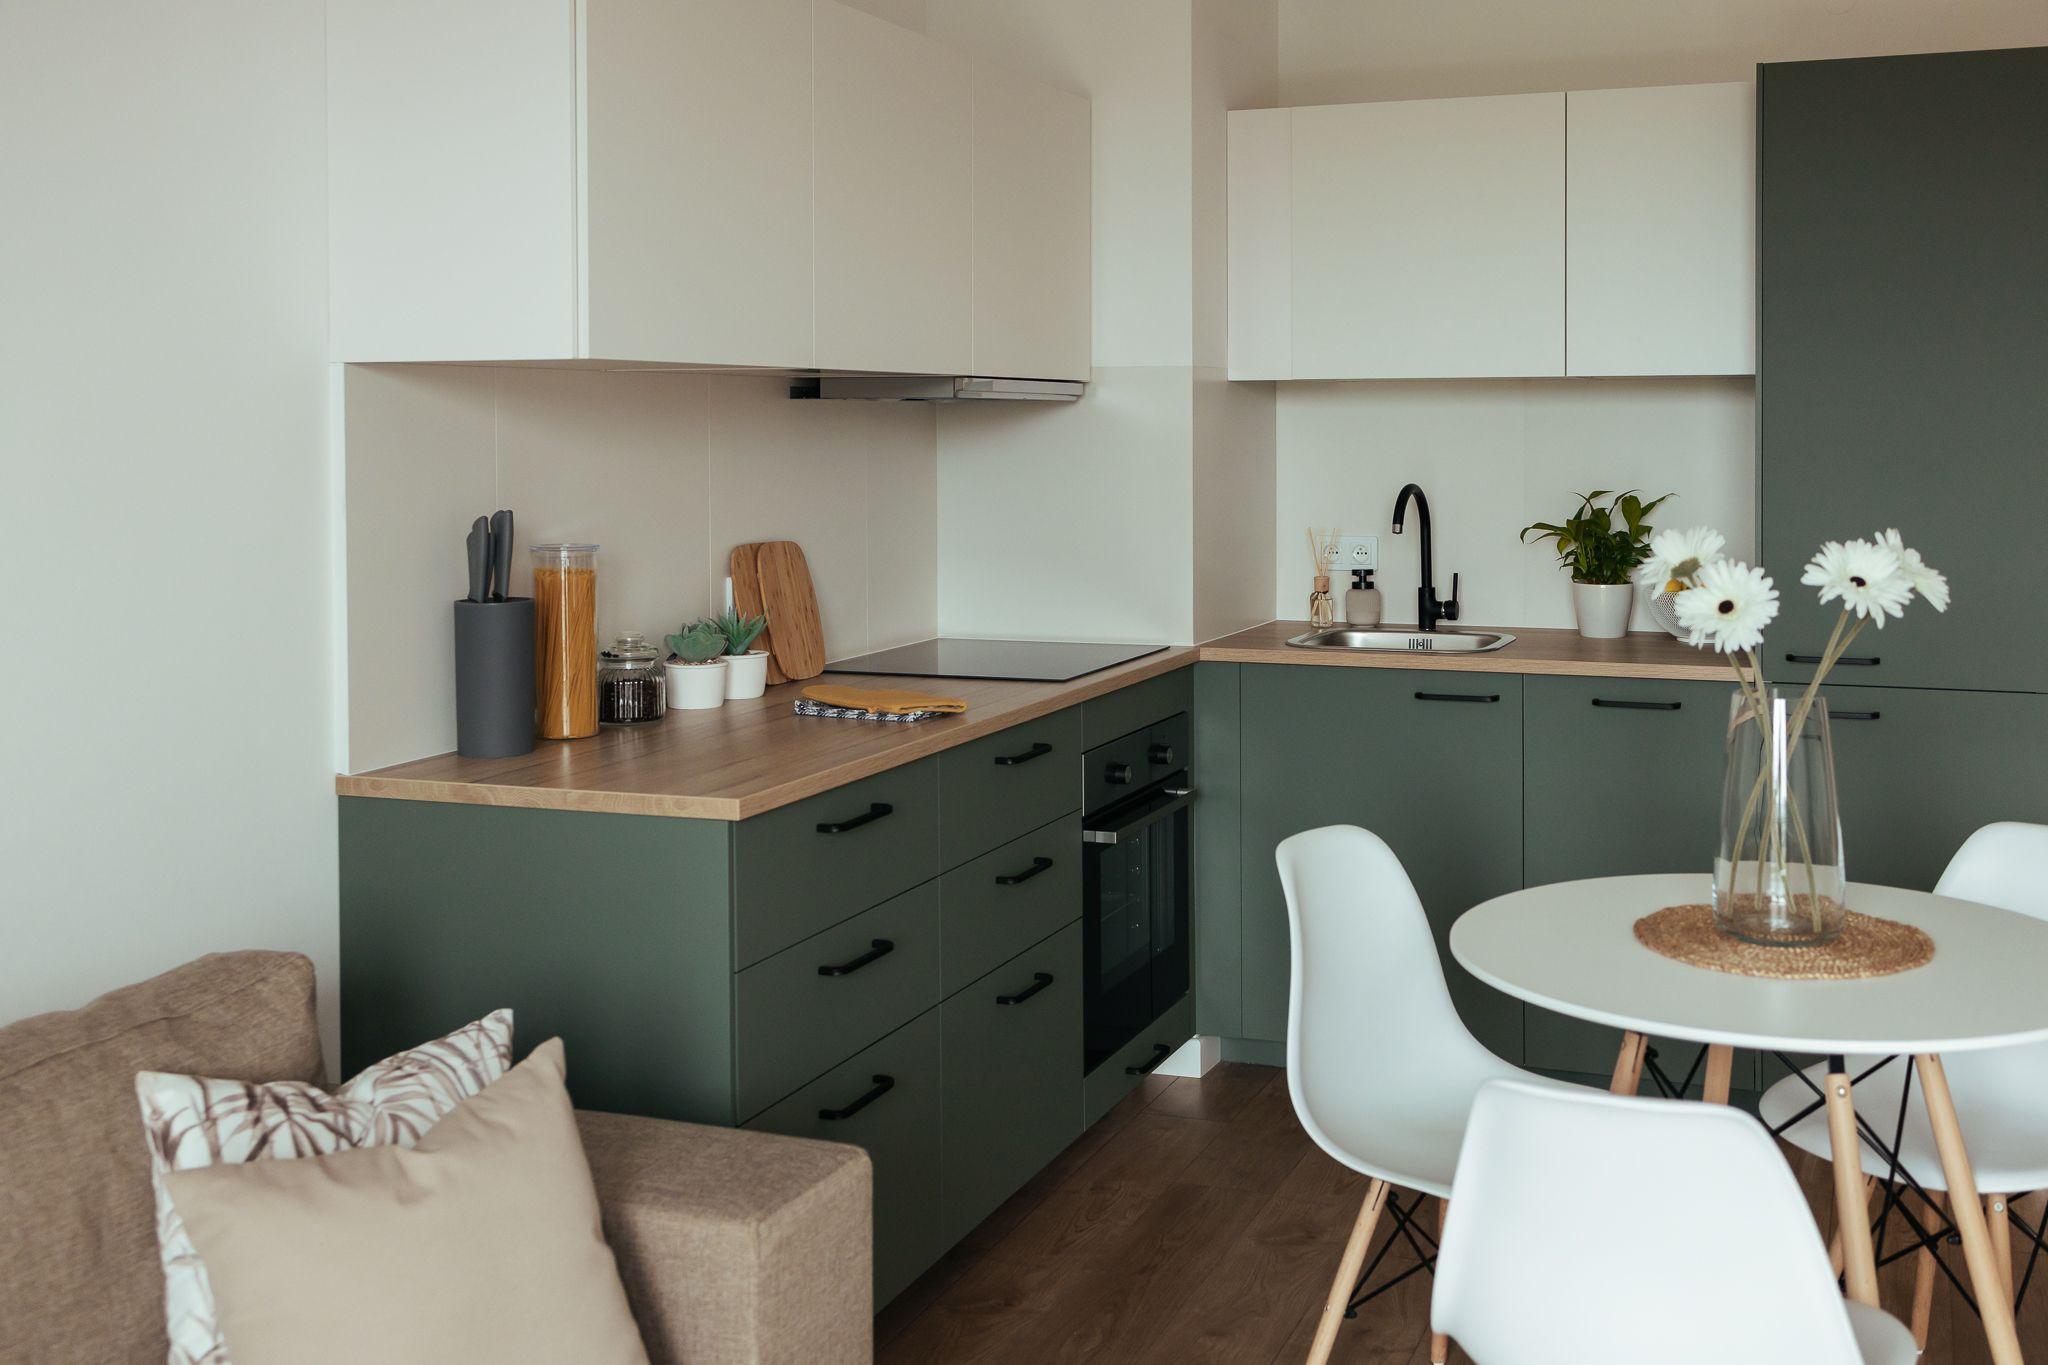 Zielona Kuchnia Green Kitchen Ikea Metod Kitchen Kitchen Decor Apartment Kitchen